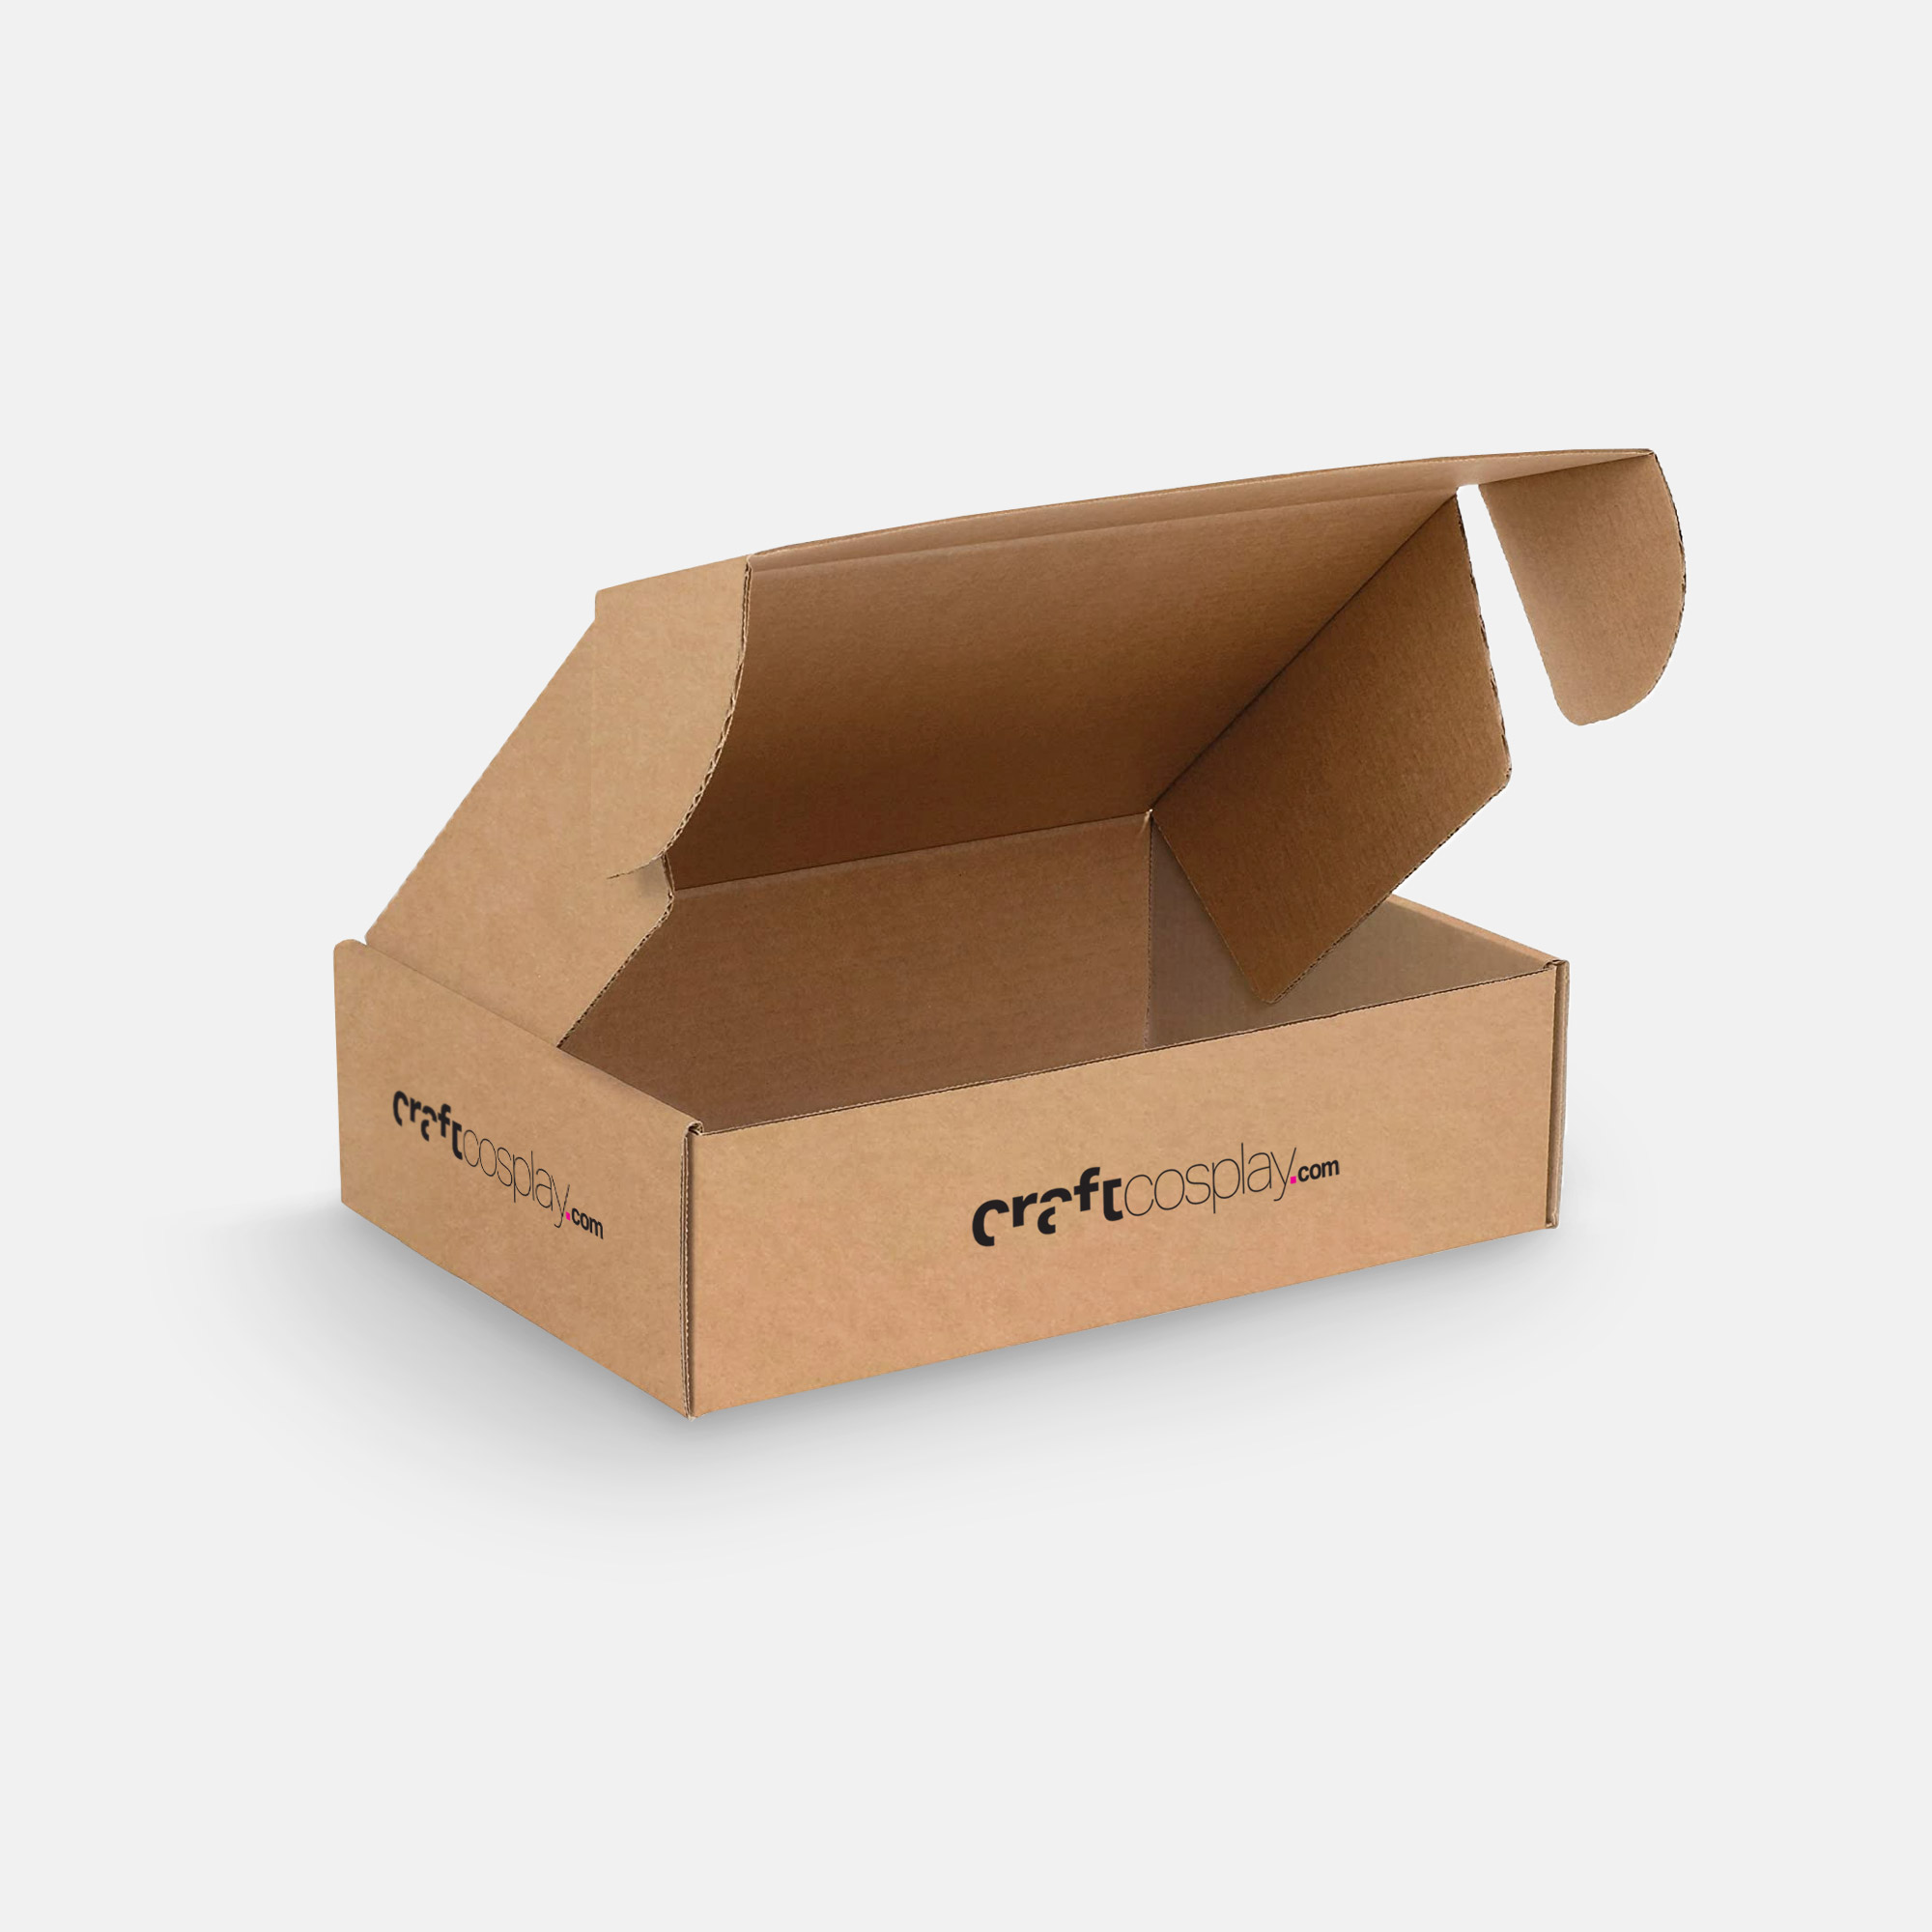 CraftCosplay Fosshape Build Kit Box